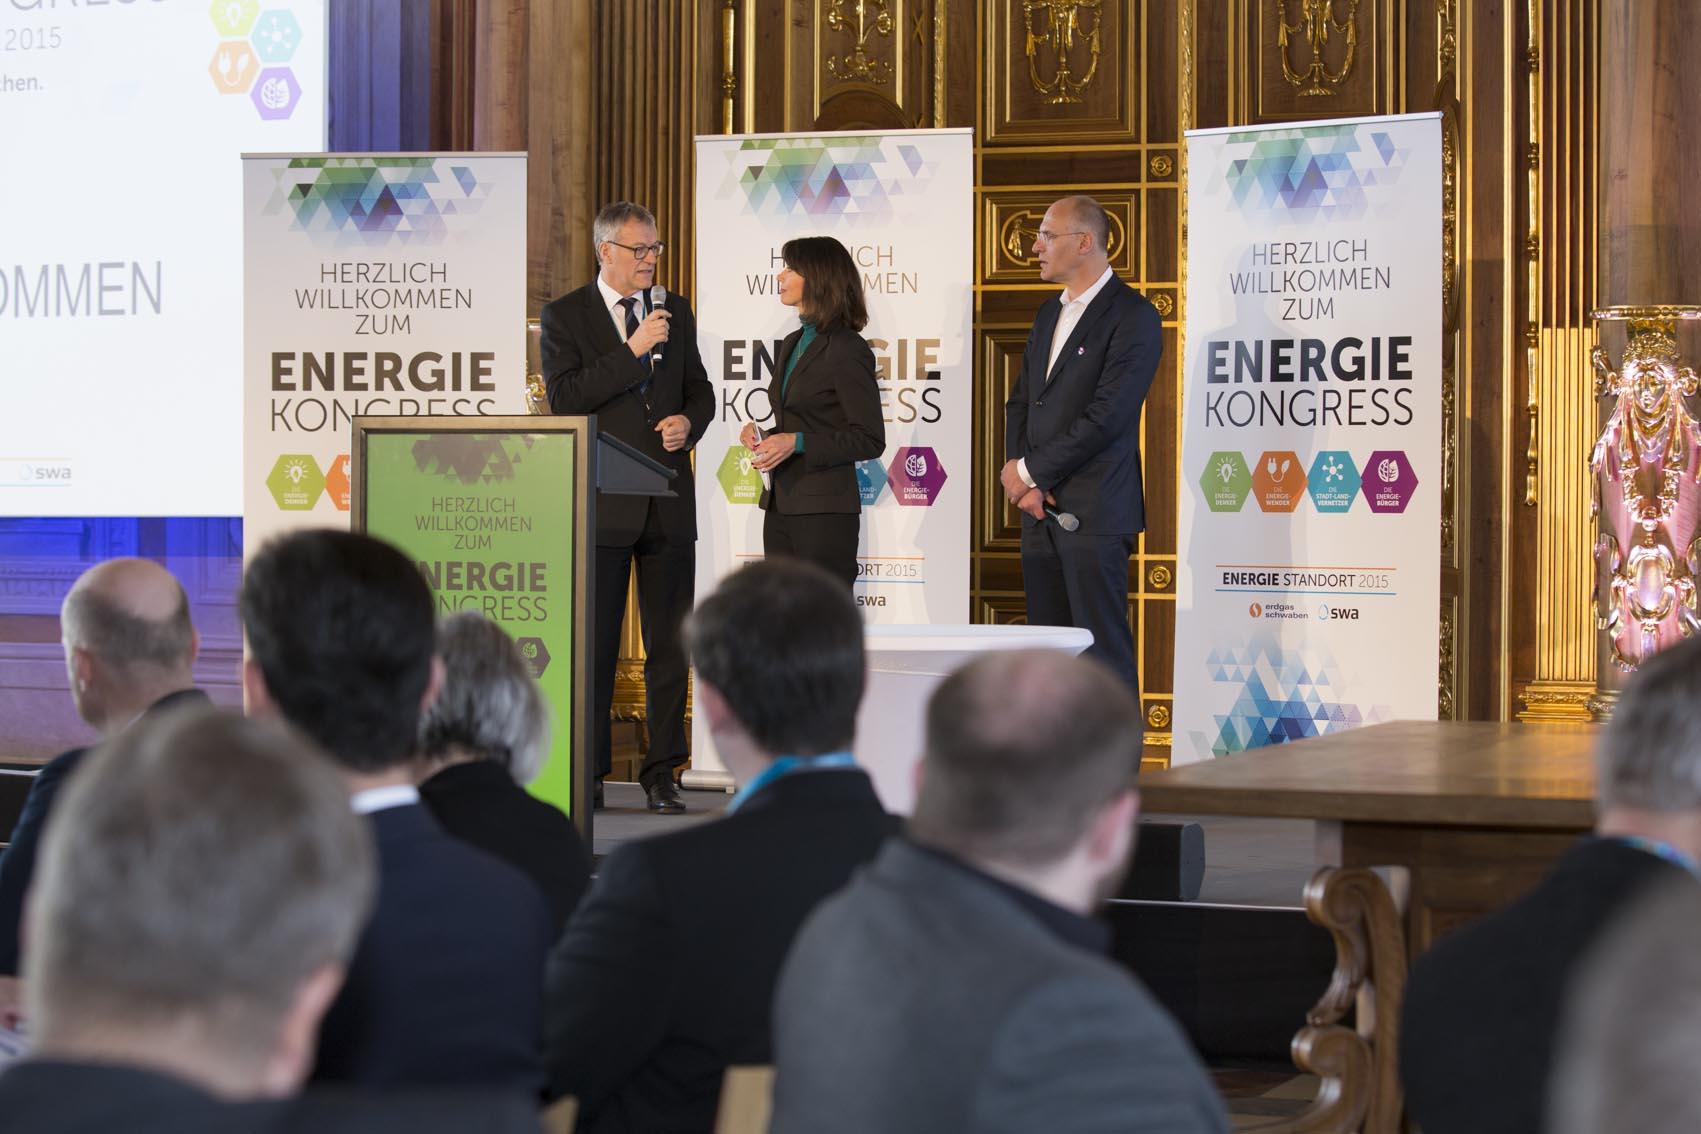 Energiekongress Event